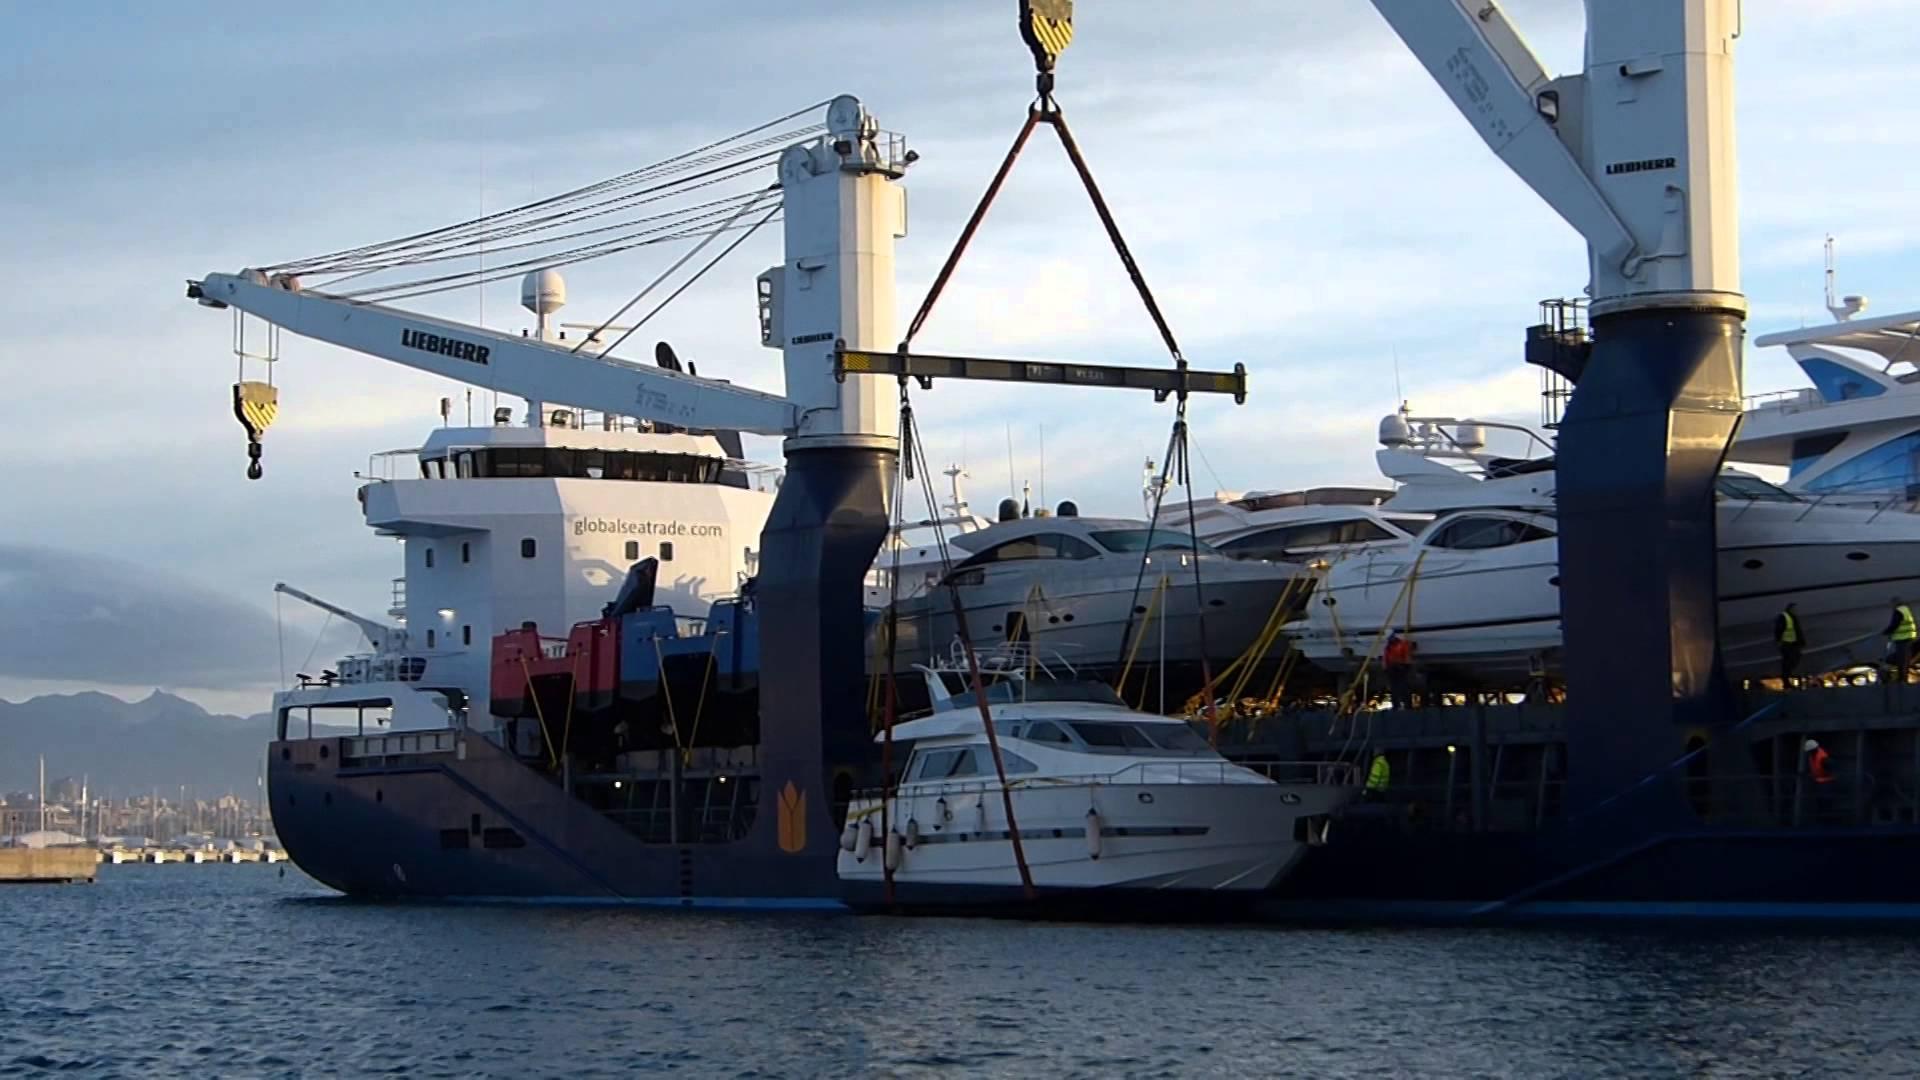 Boat Carrier Vessel